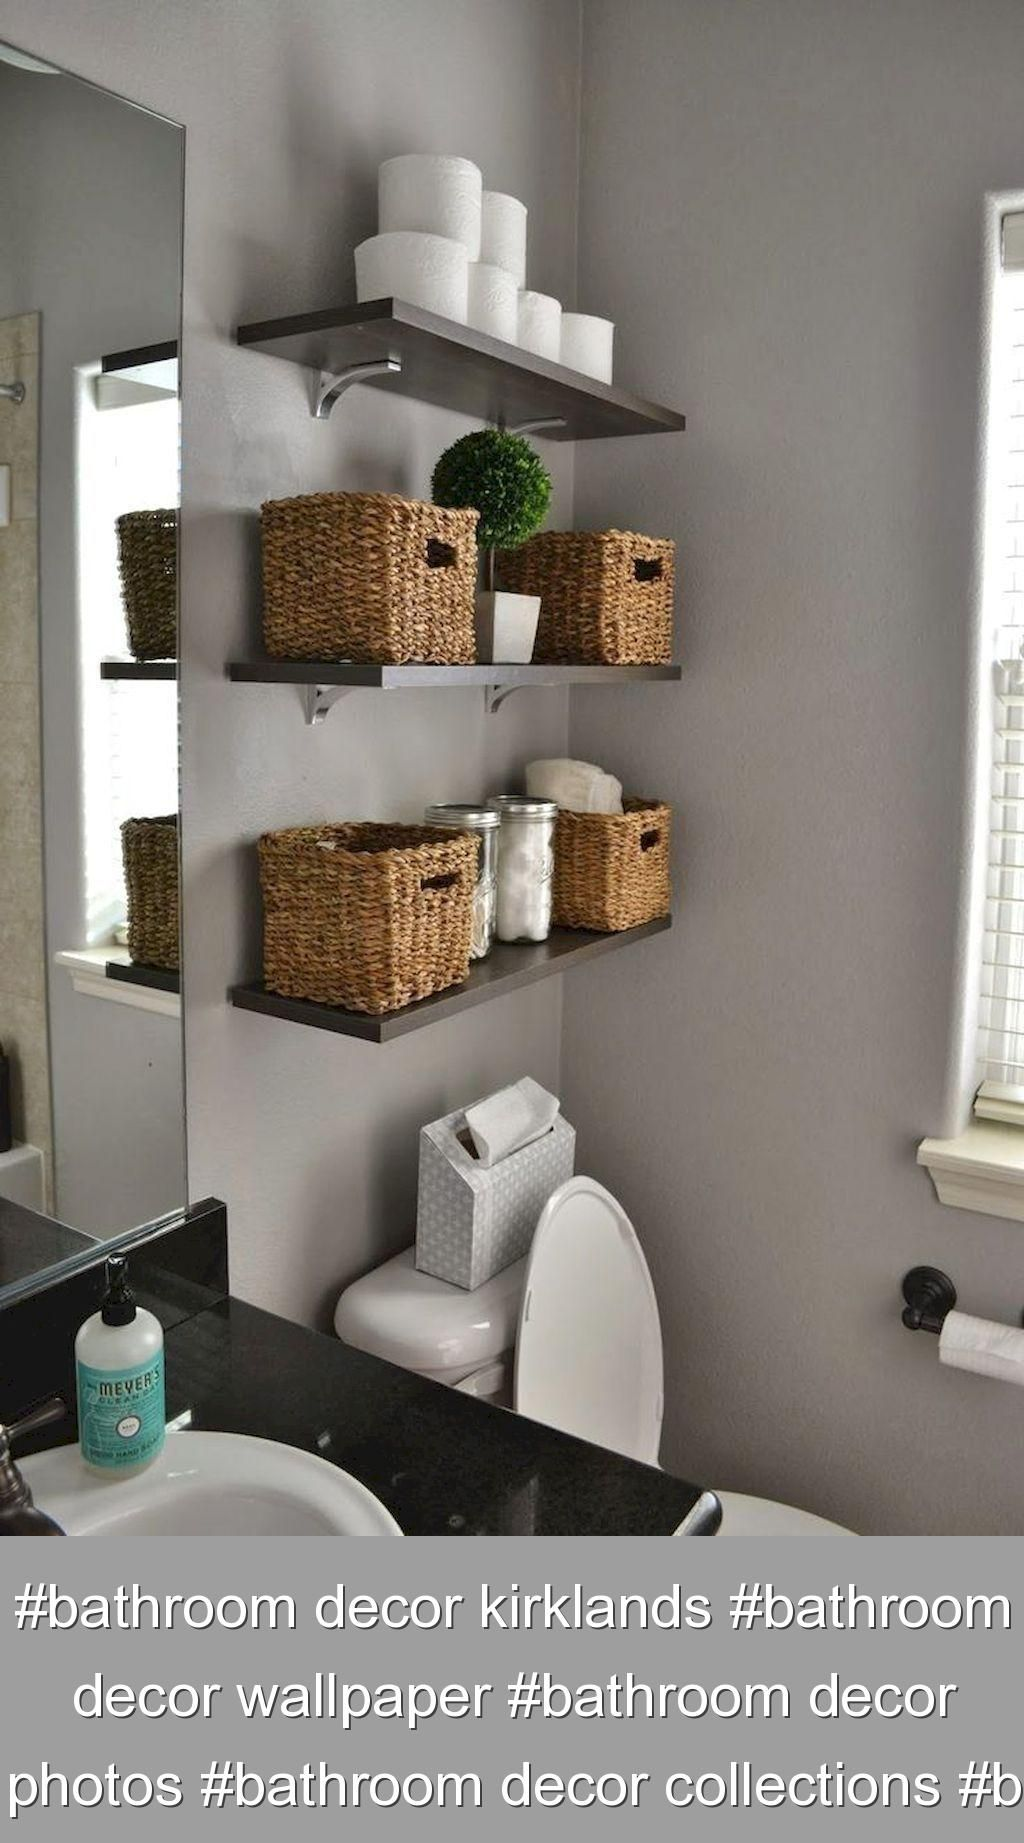 bathroom decor kirklands #bathroom decor wallpaper #bathroom decor